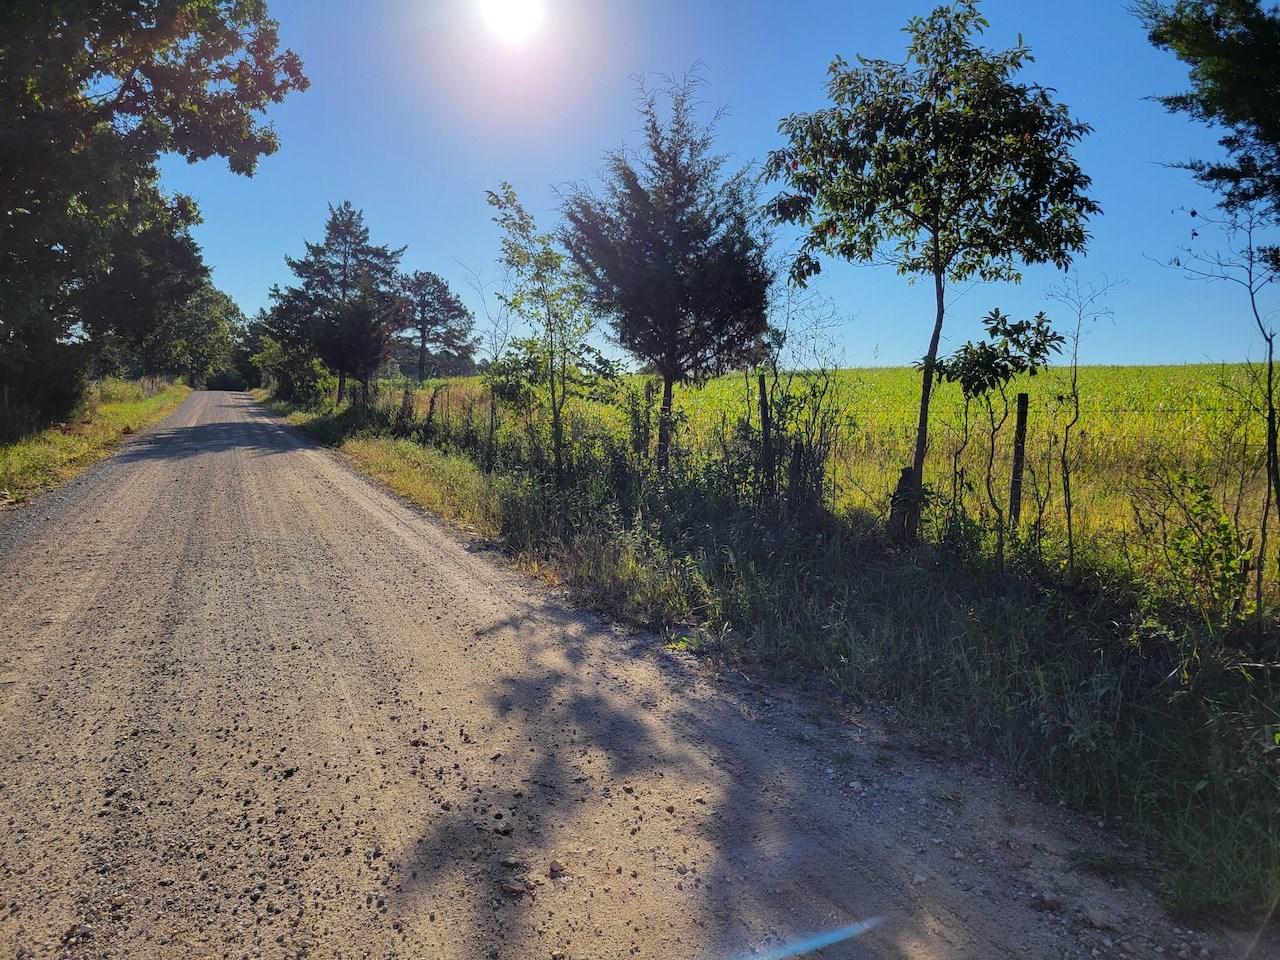 Southern Missouri Land for Sale - Mountain Grove, MO